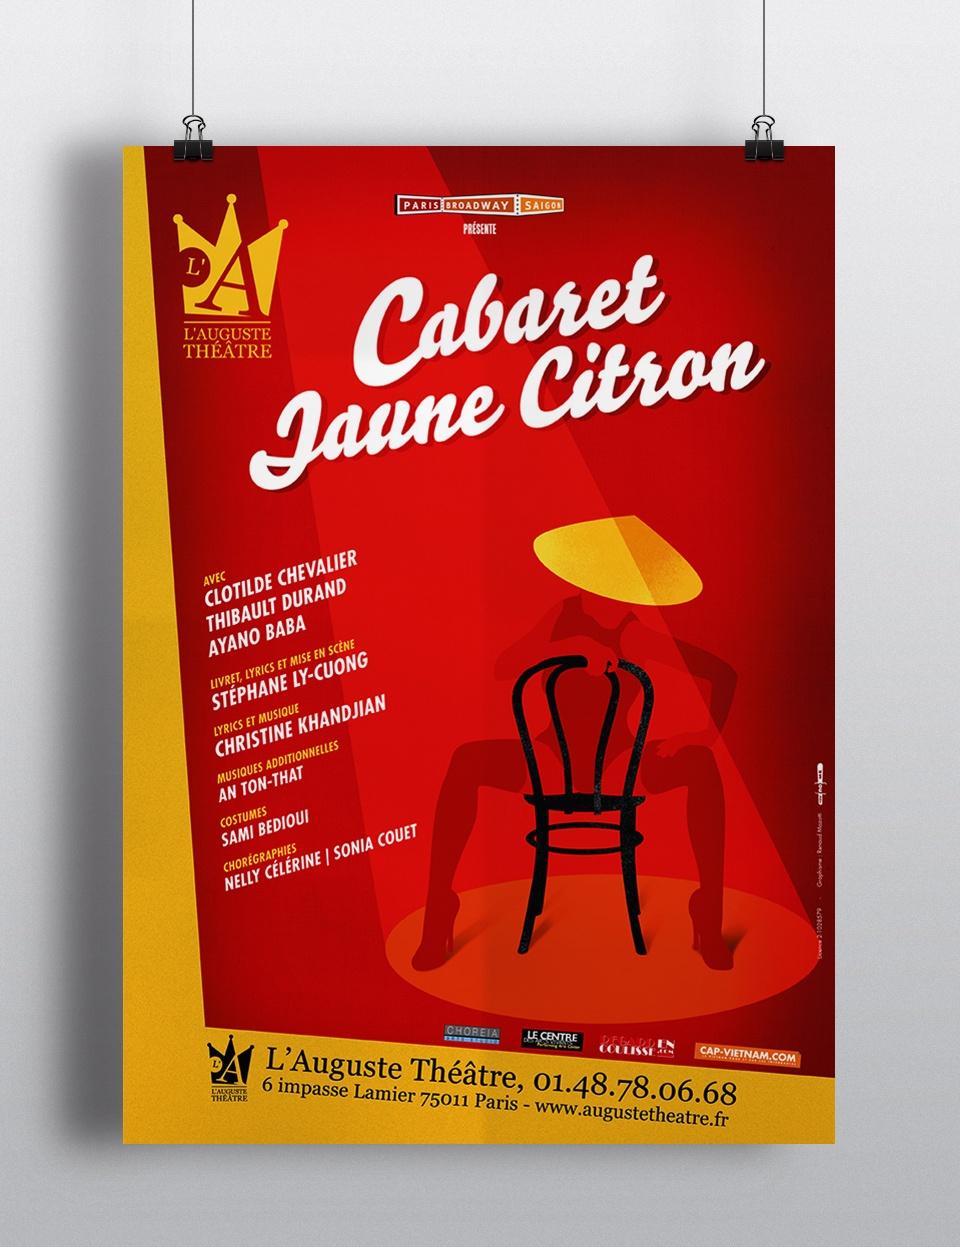 Affiche du spectacle musical « Cabaret Jaune Citron »